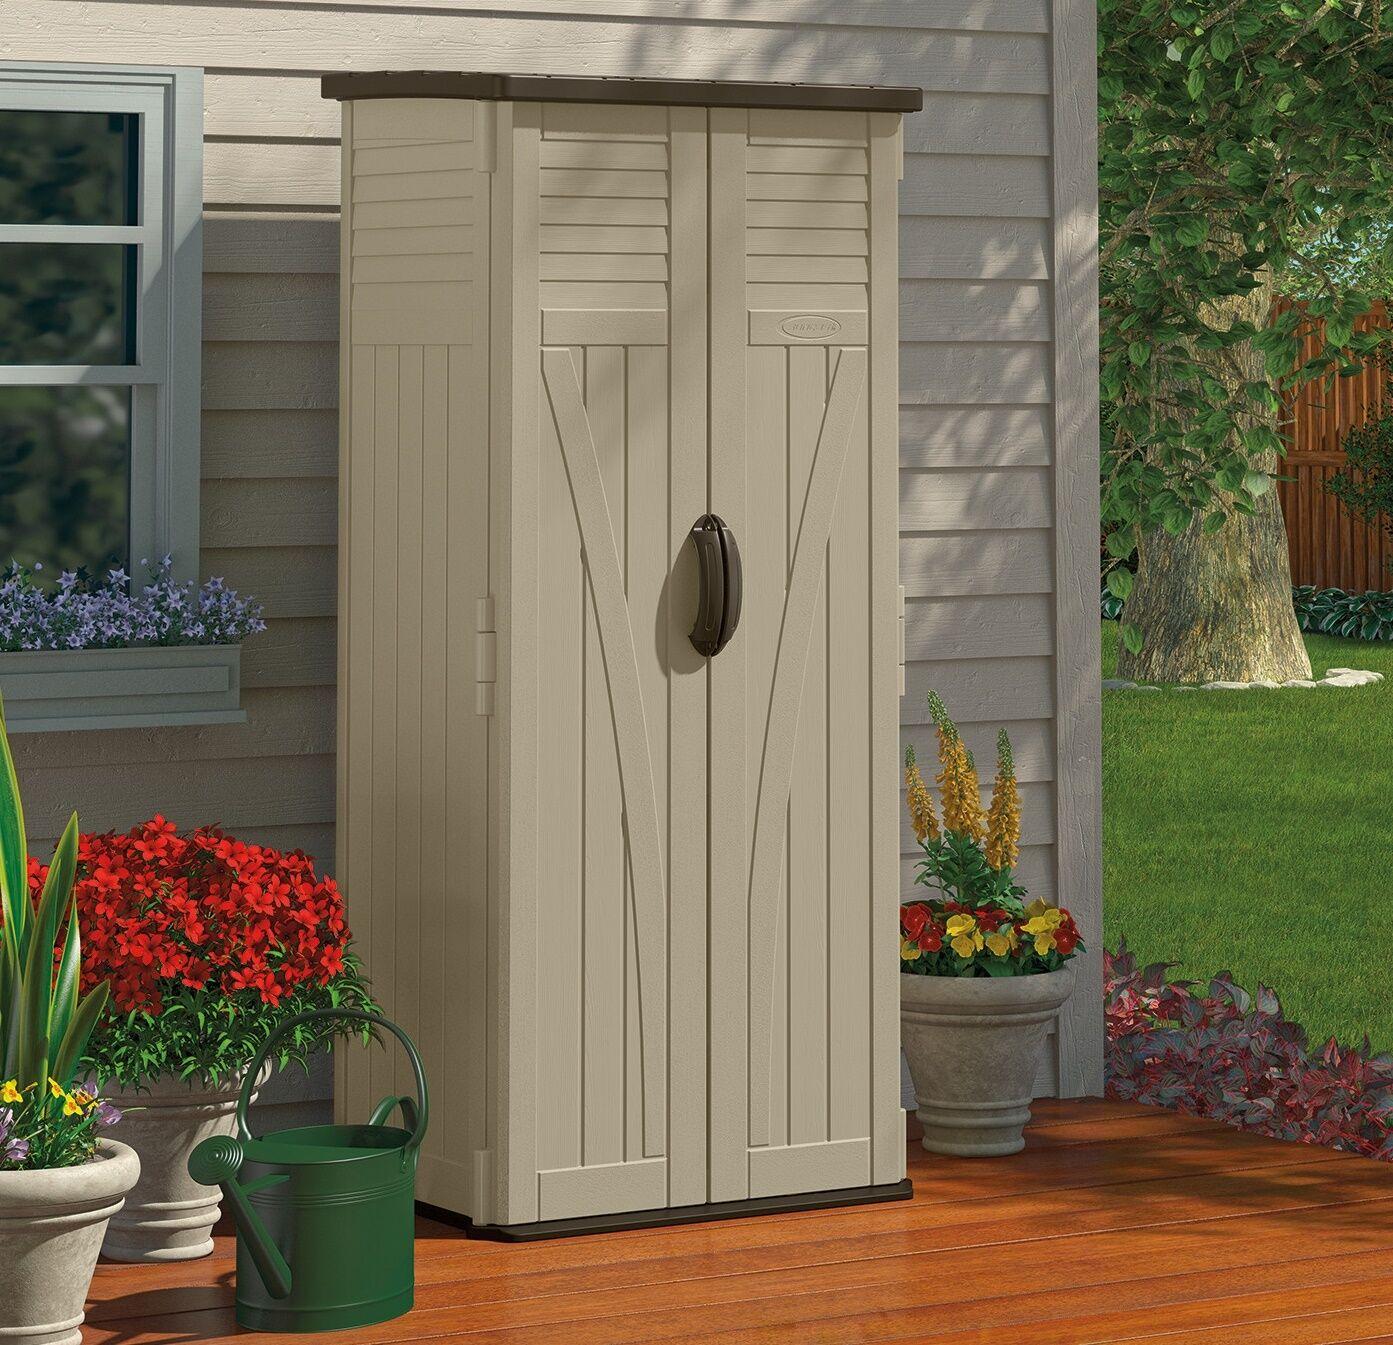 Outdoor Storage Cabinet Garden Shed Tools Patio Vertical Backyard ...